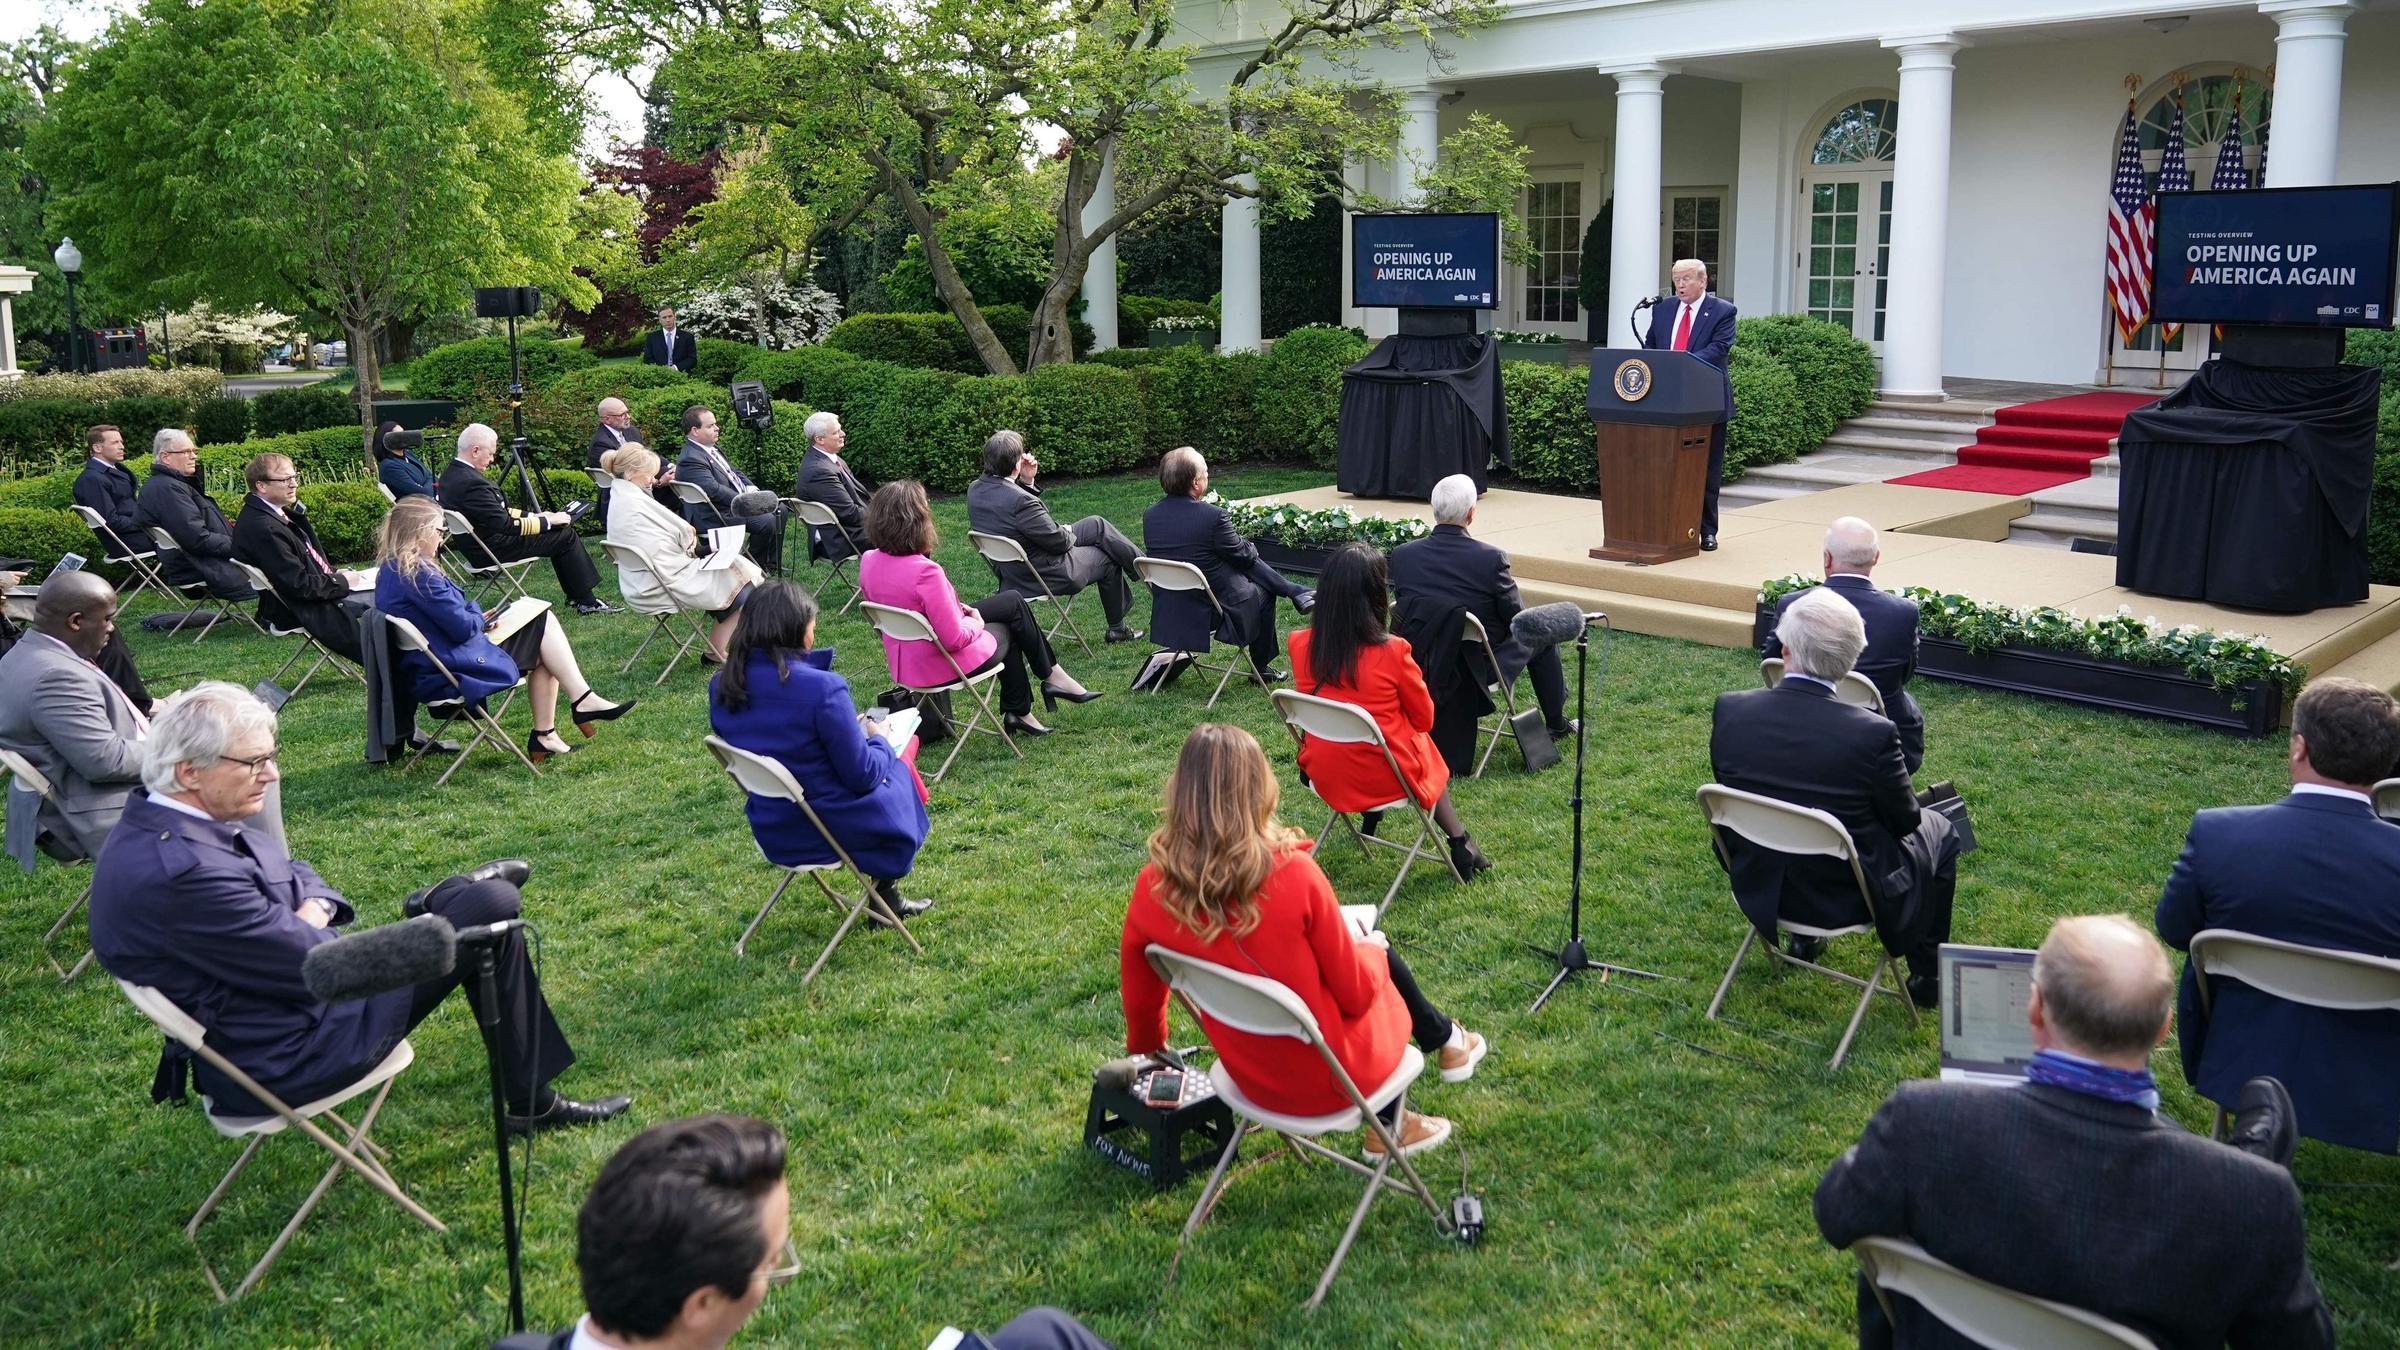 White House Releases Coronavirus